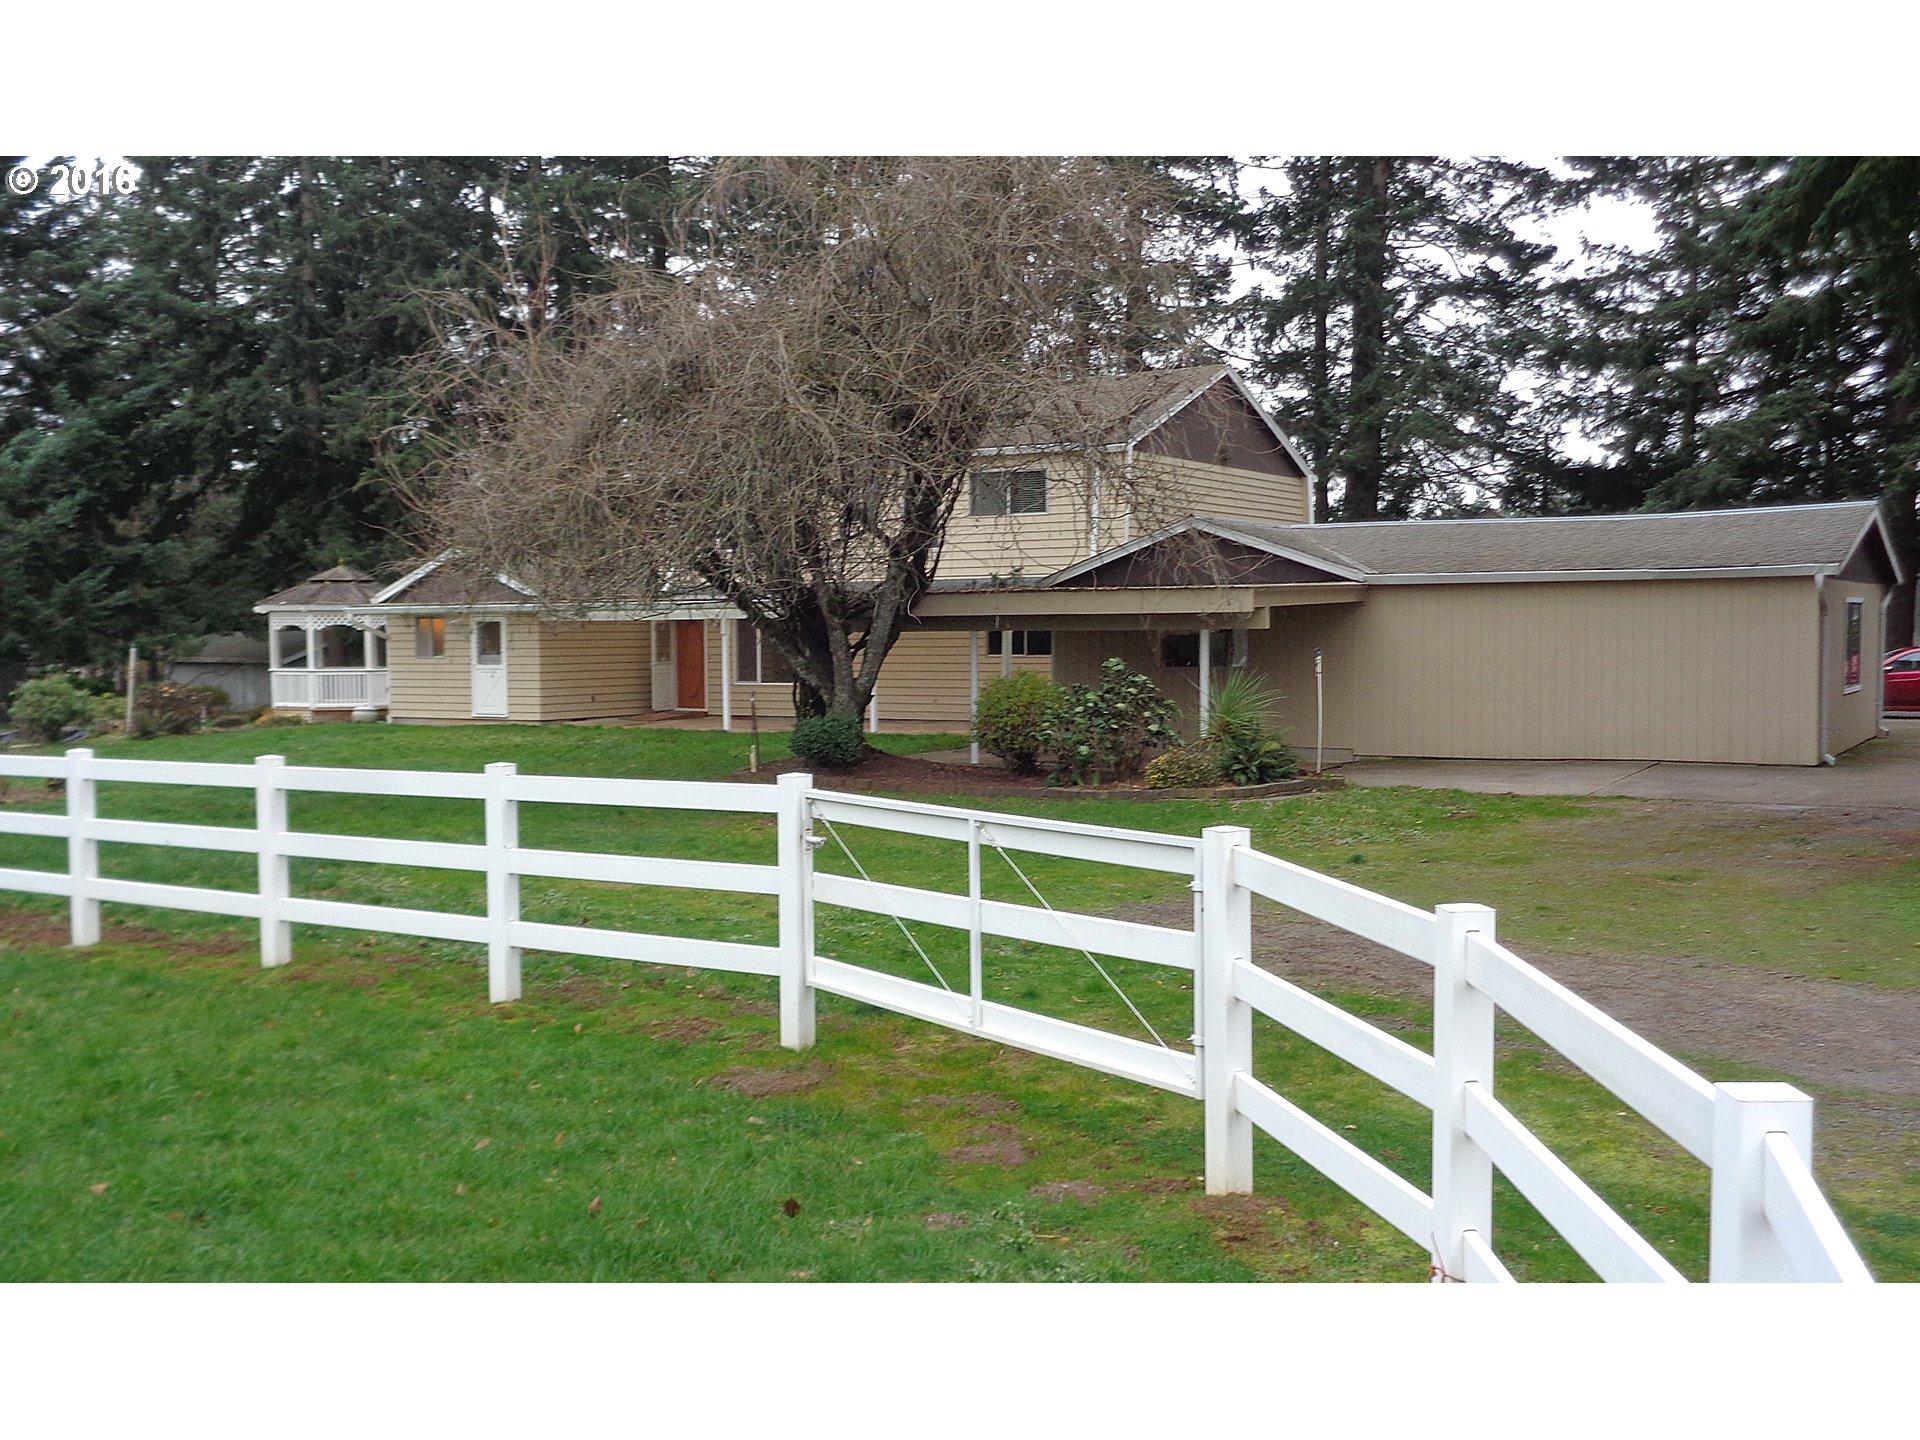 20560 BEAVERCREEK RD, Oregon City, OR 97045